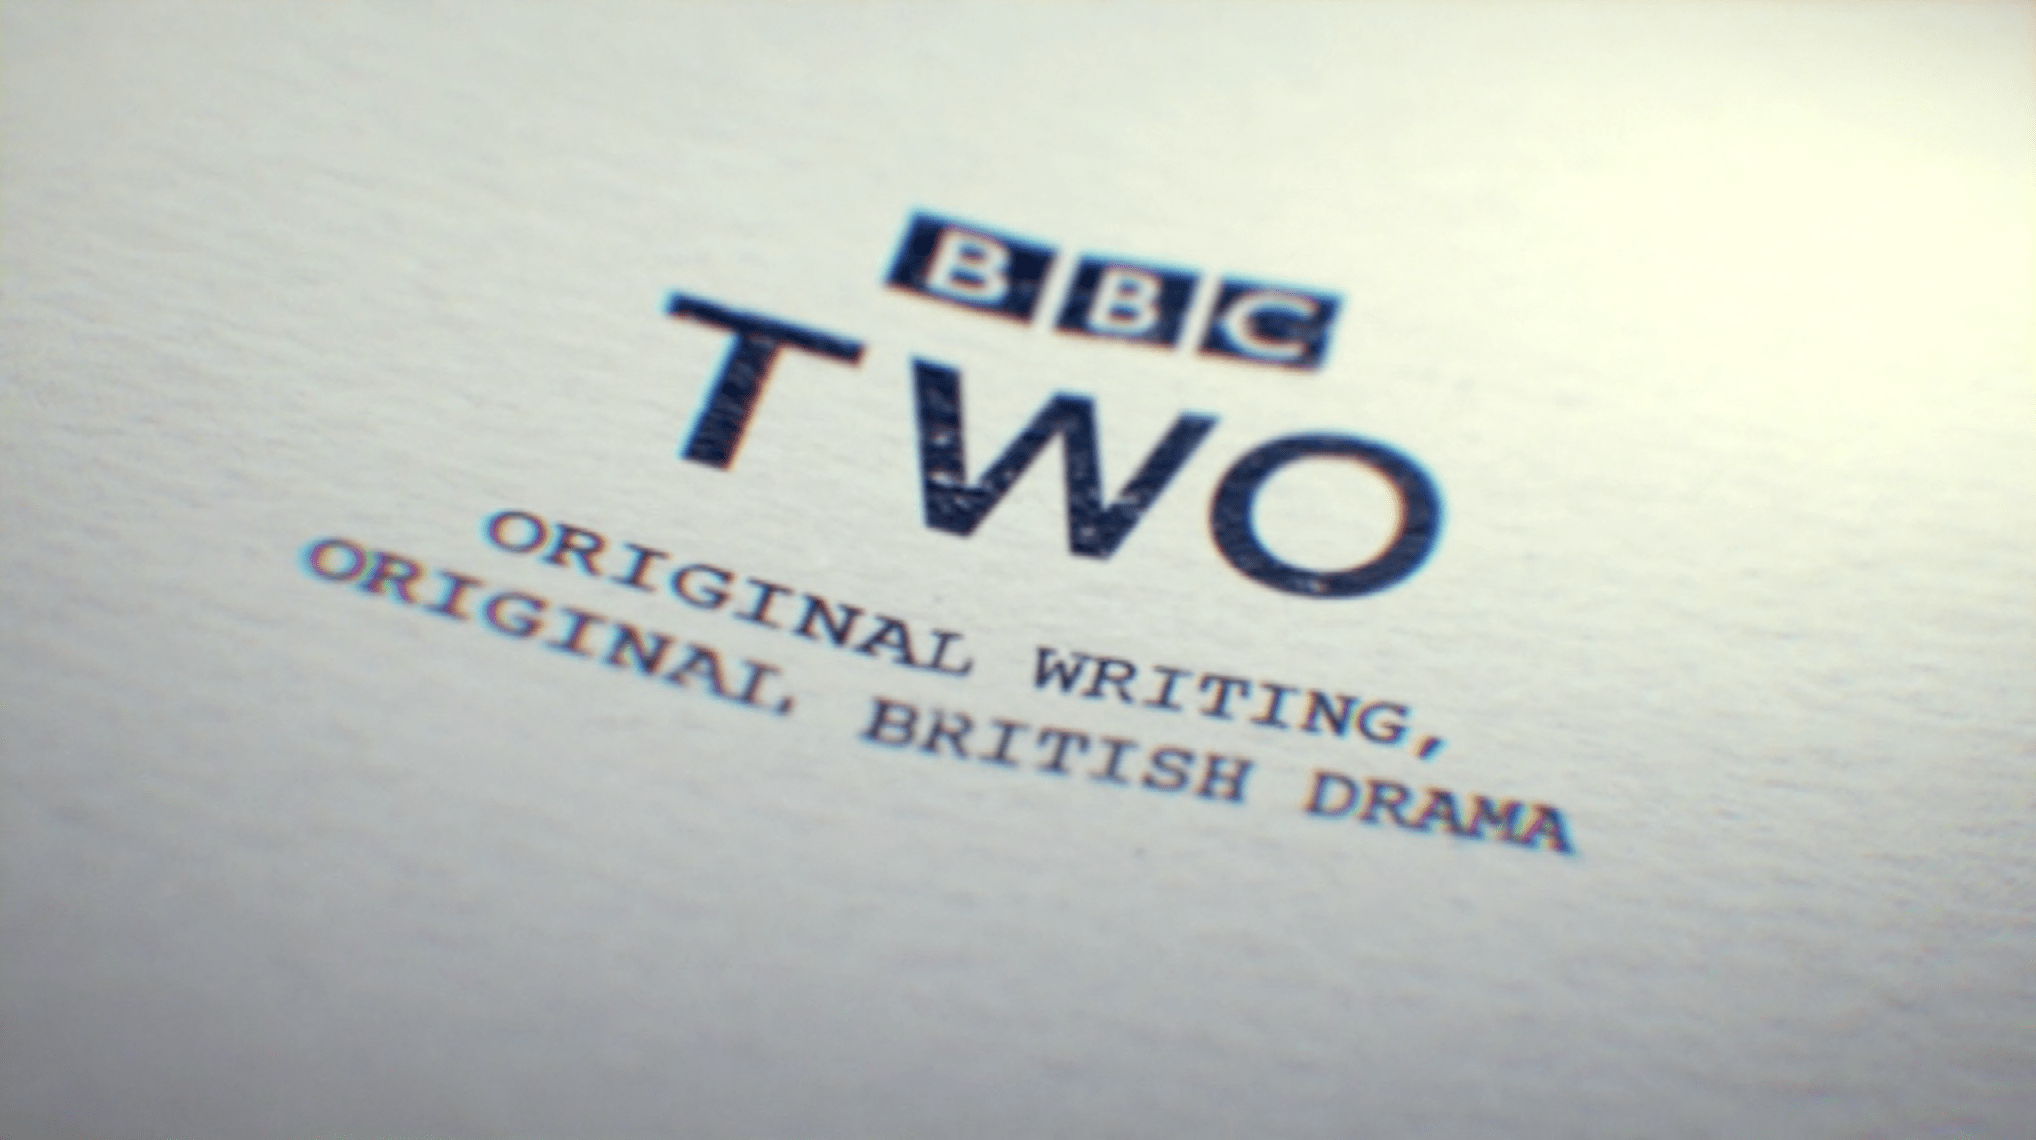 ORIGINAL BRTISH DRAMA BBC CREATIVE